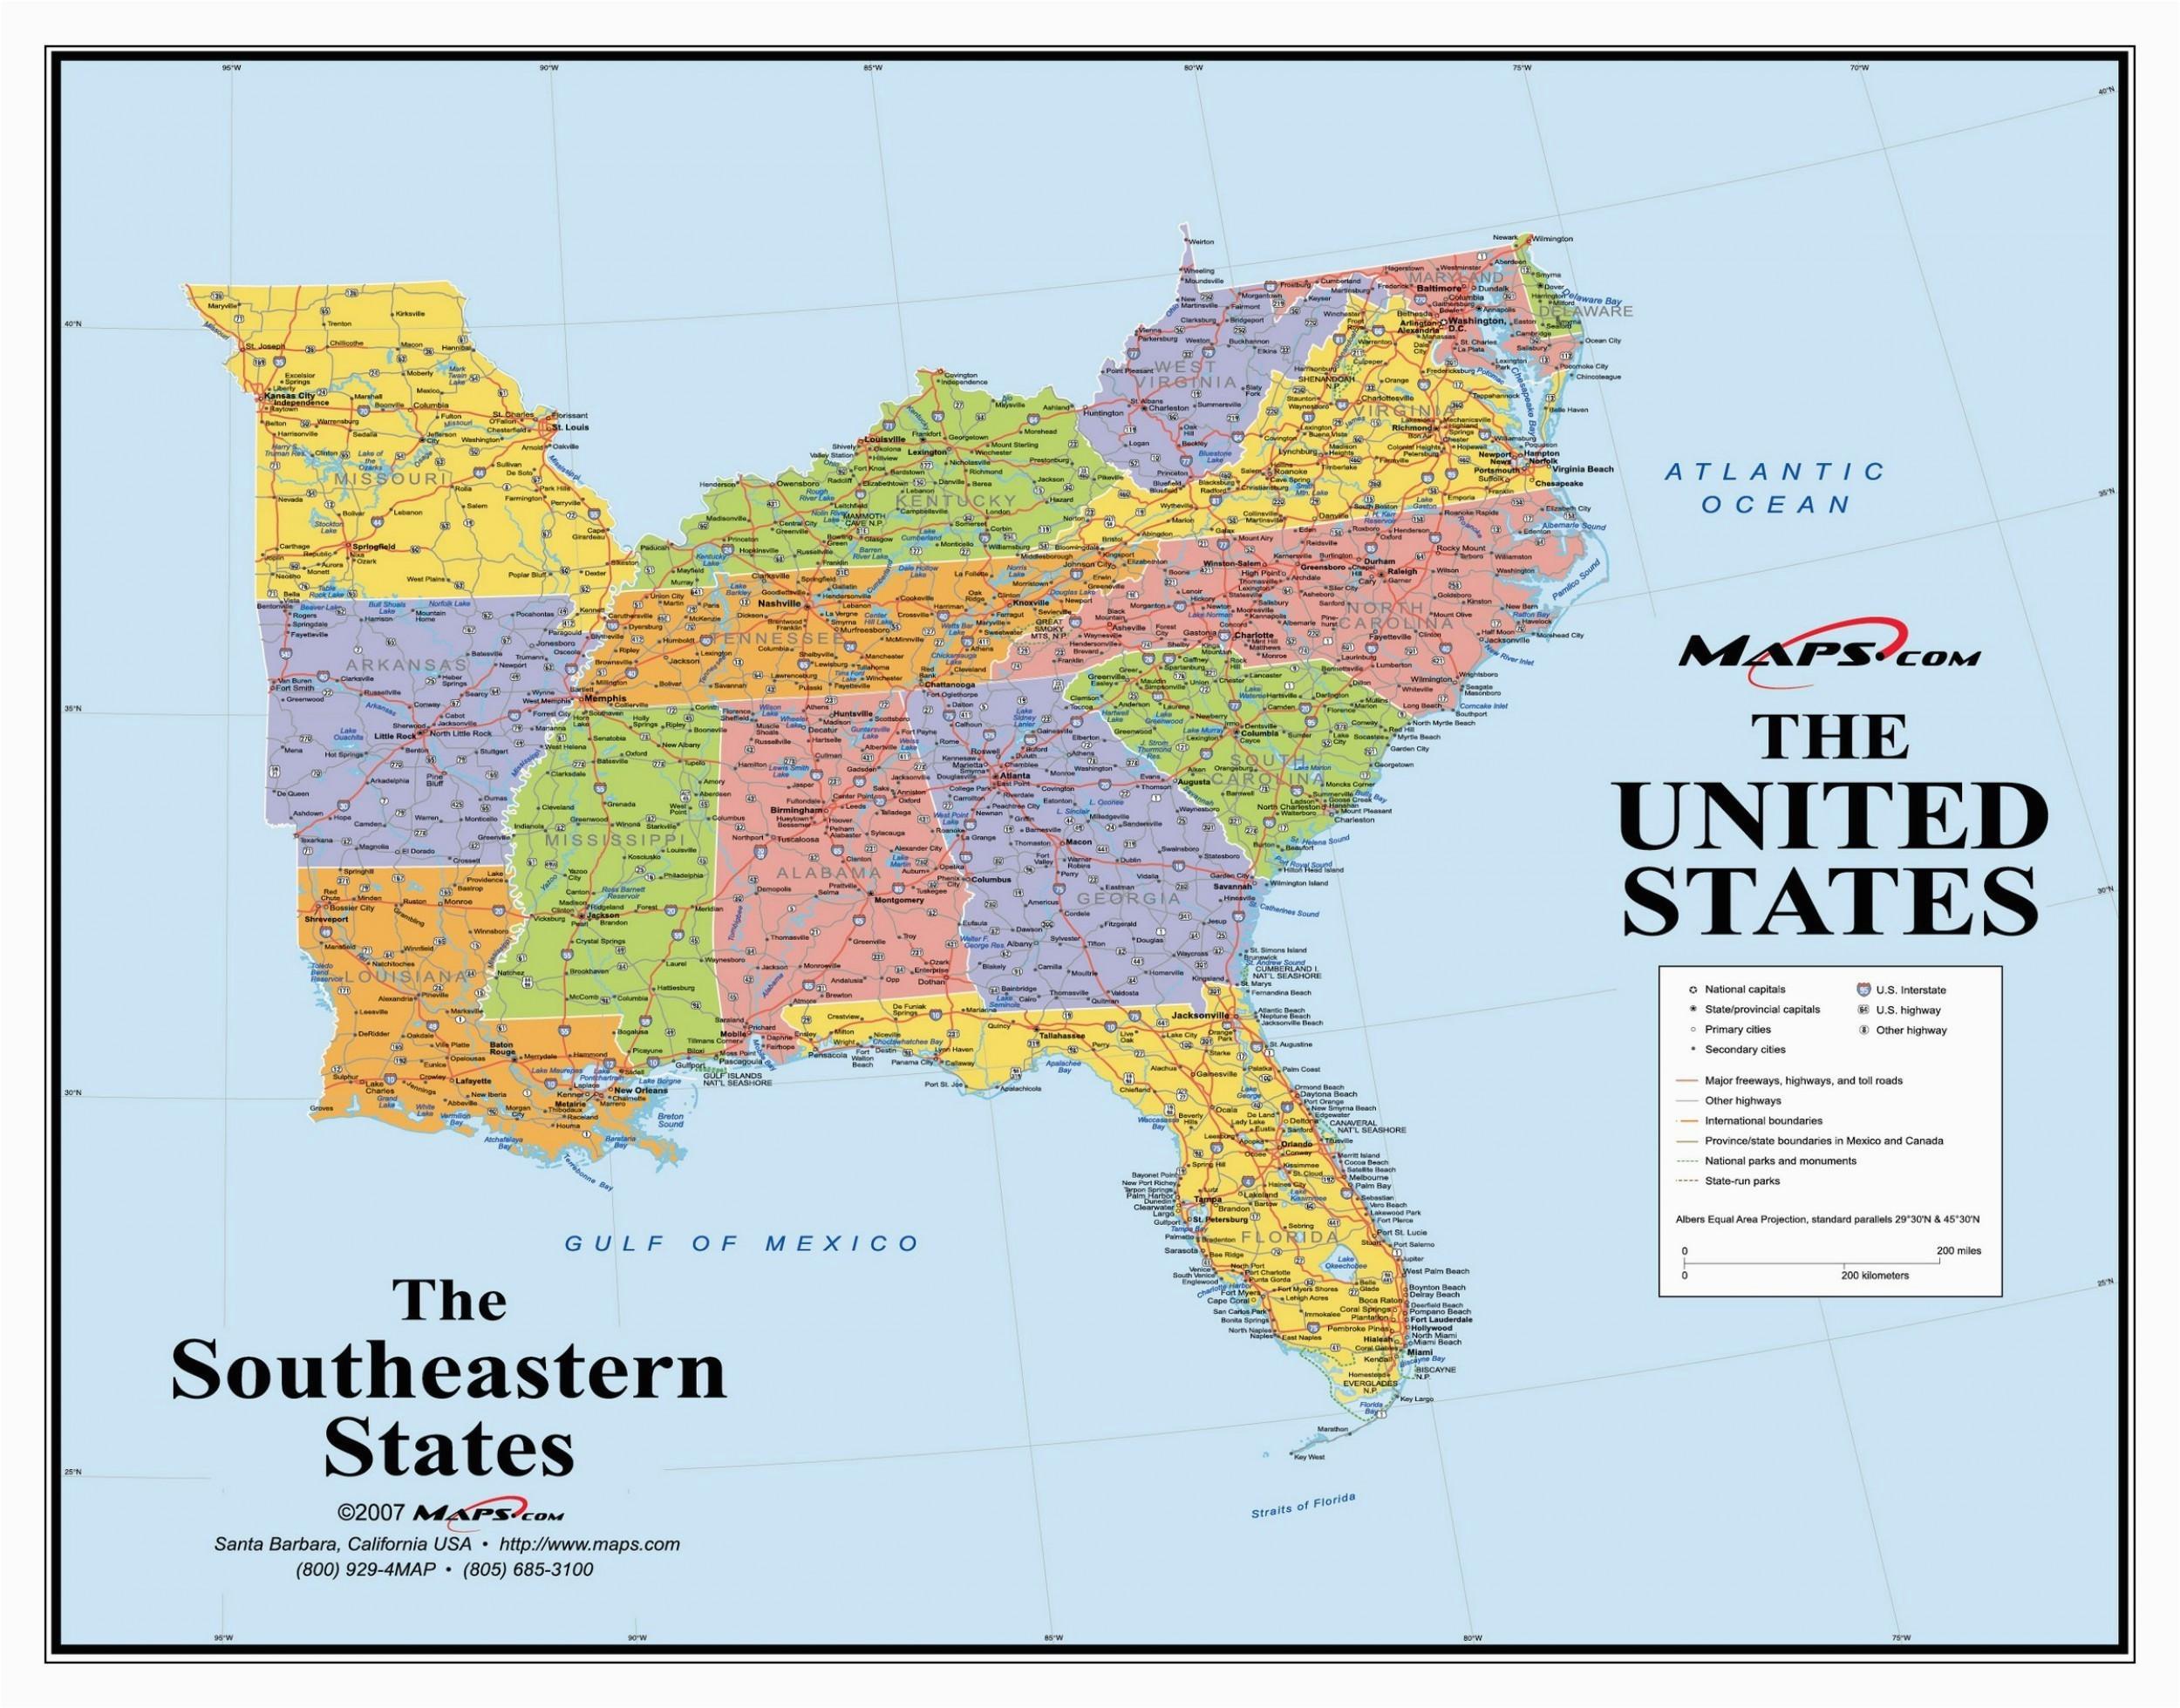 united states map phoenix arizona new map united states capitals